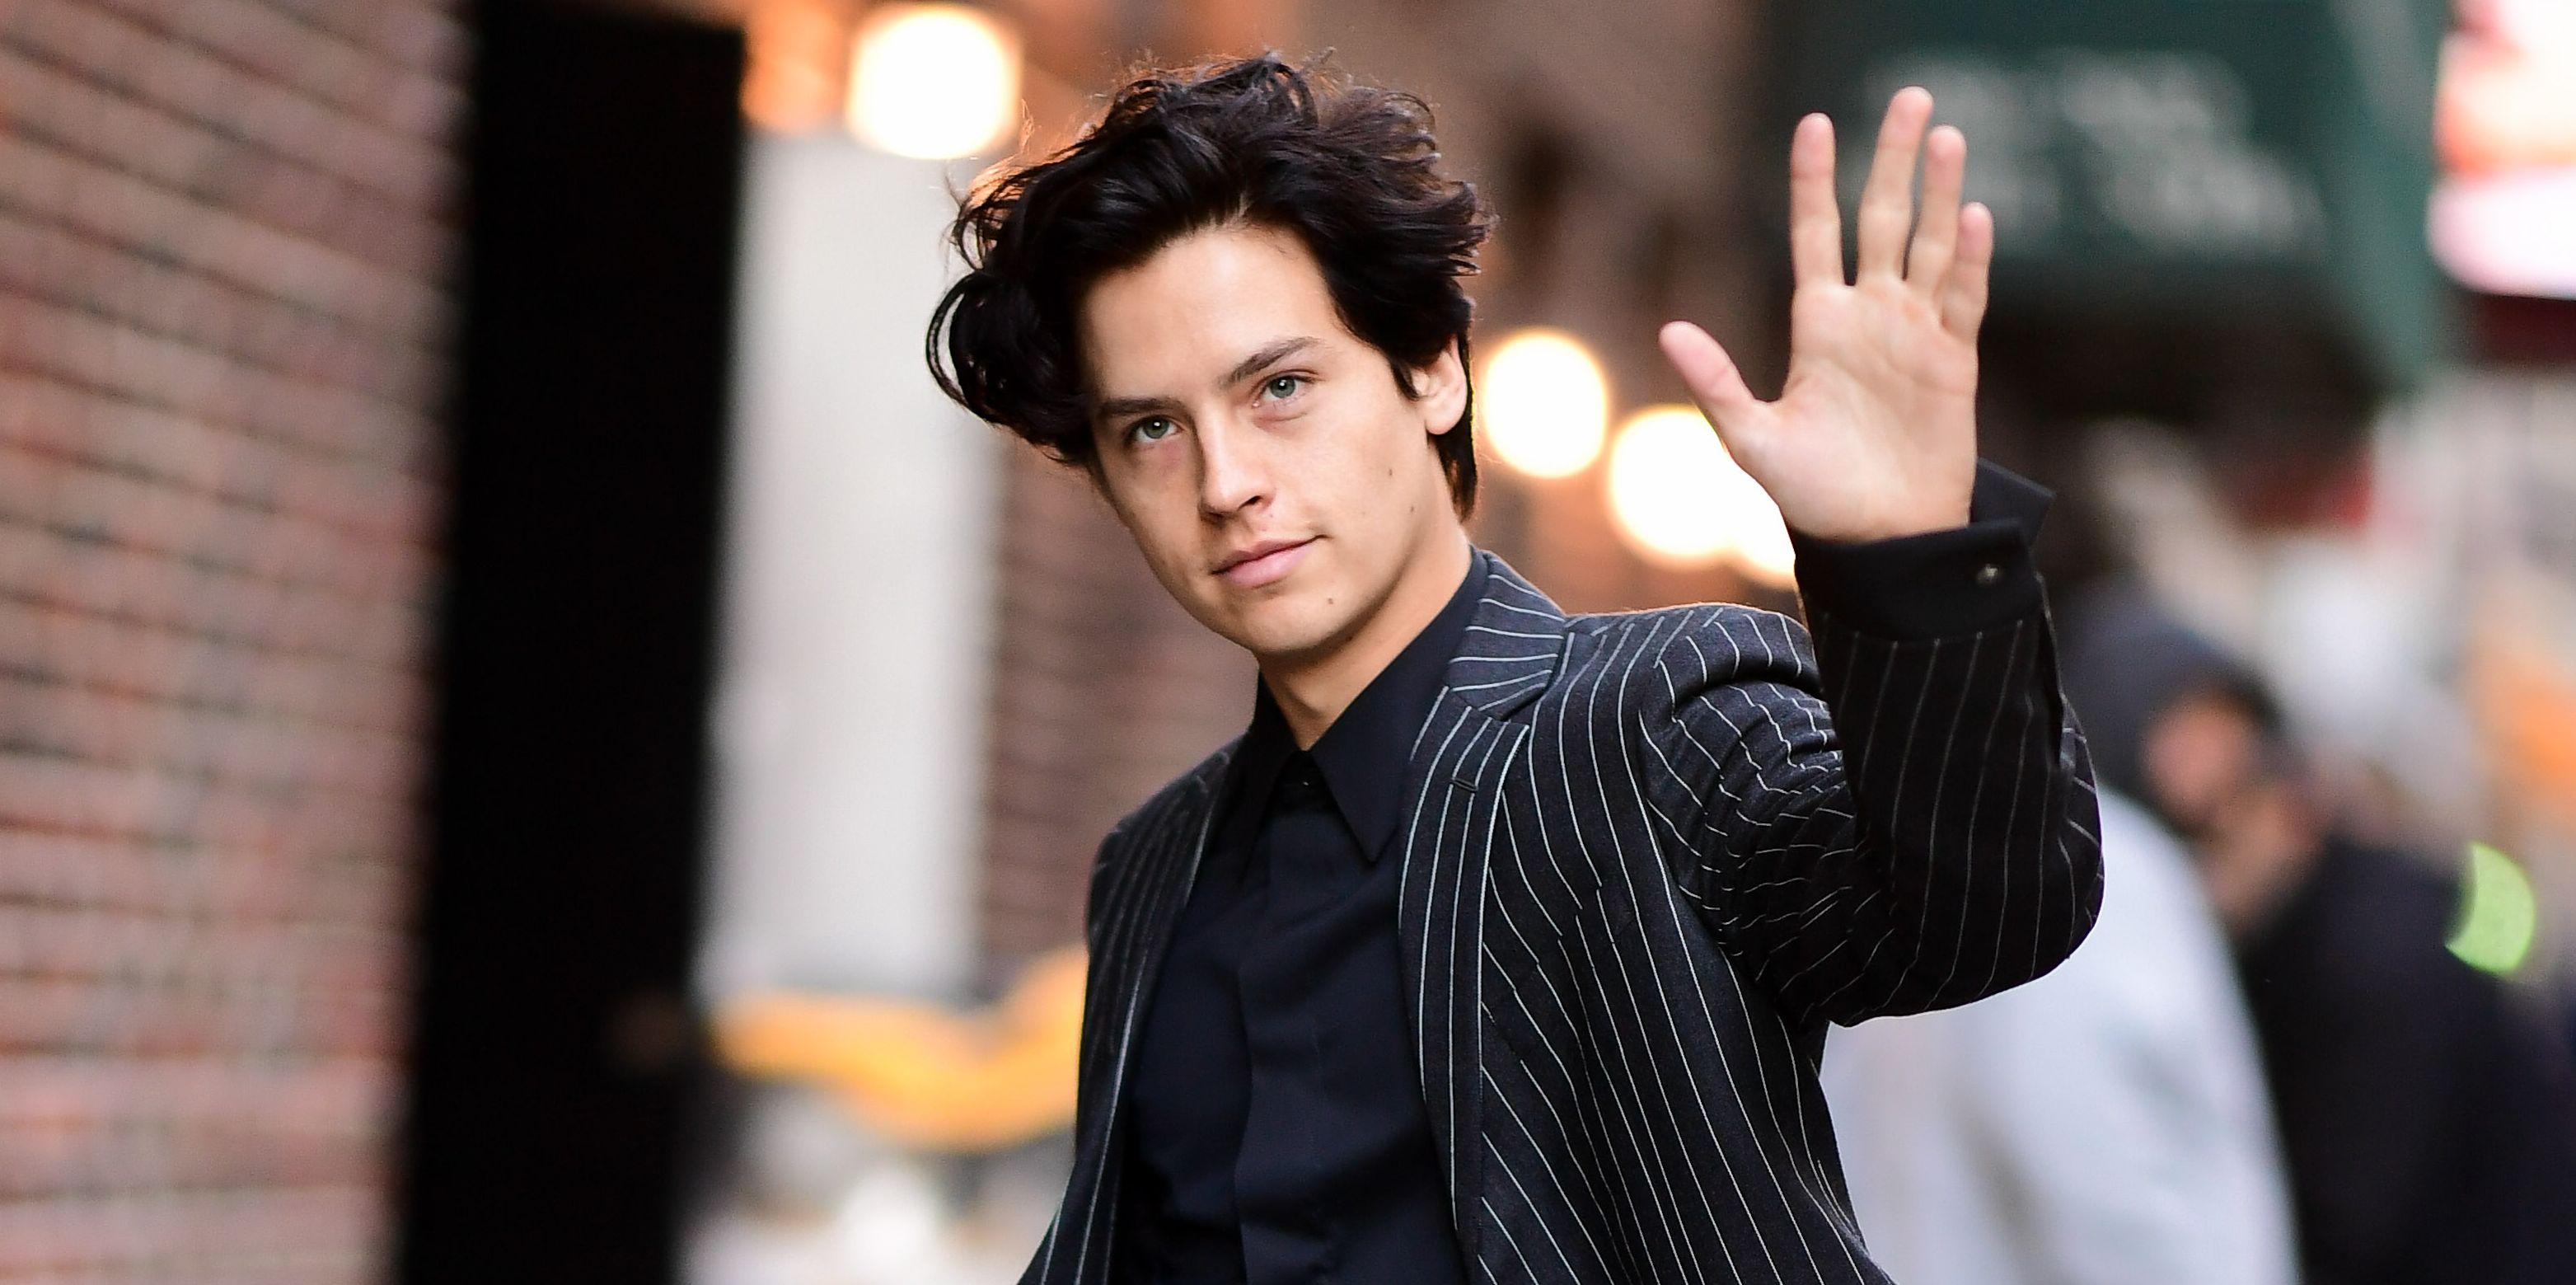 Celebrity Sightings in New York City - October 30, 2018